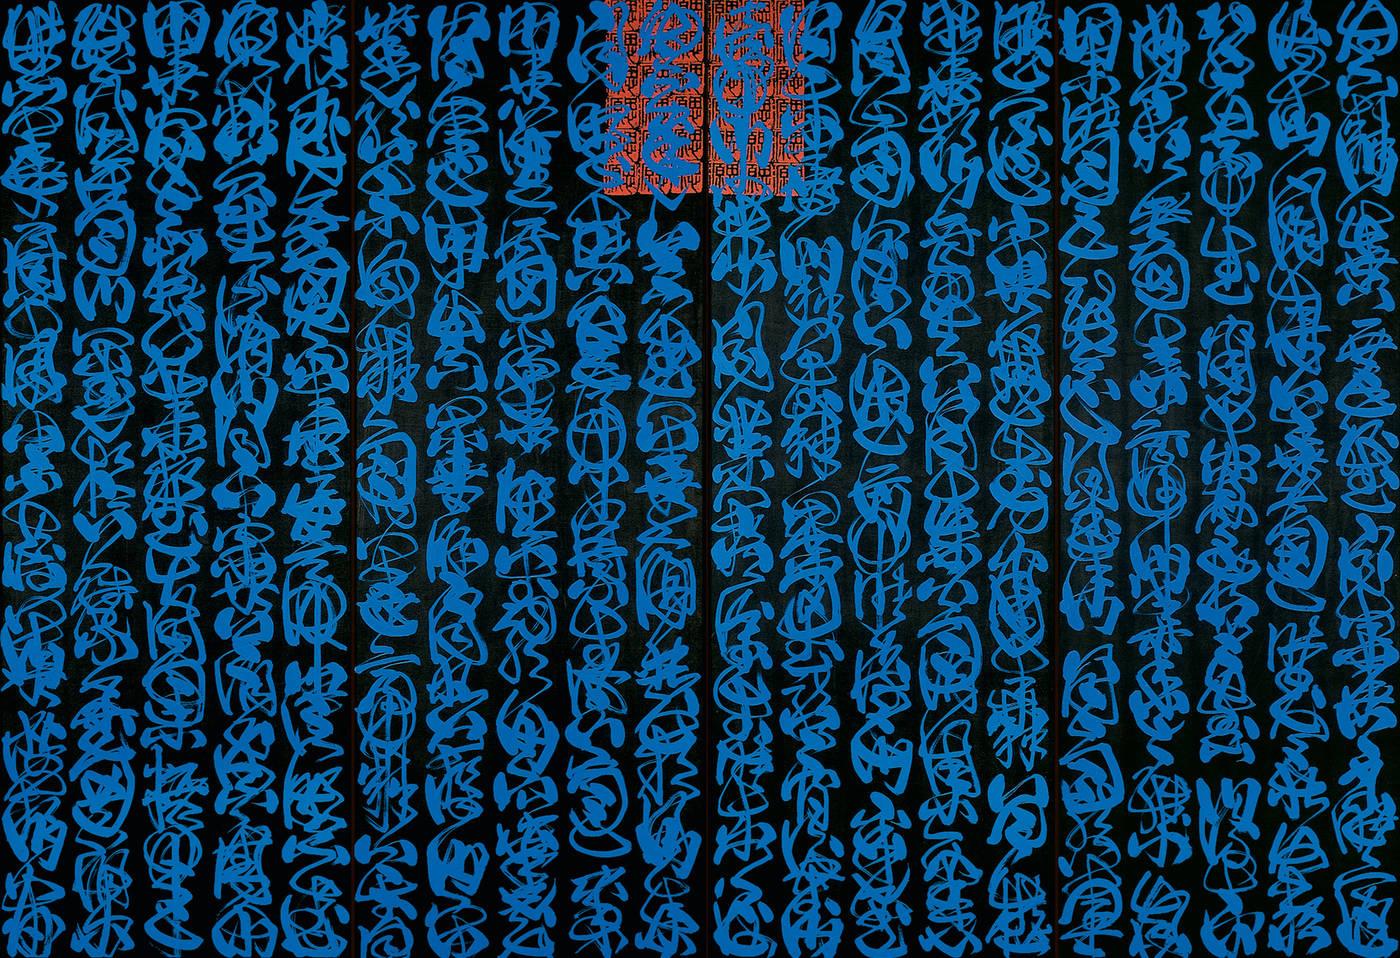 Méditations en cobalt, 1997